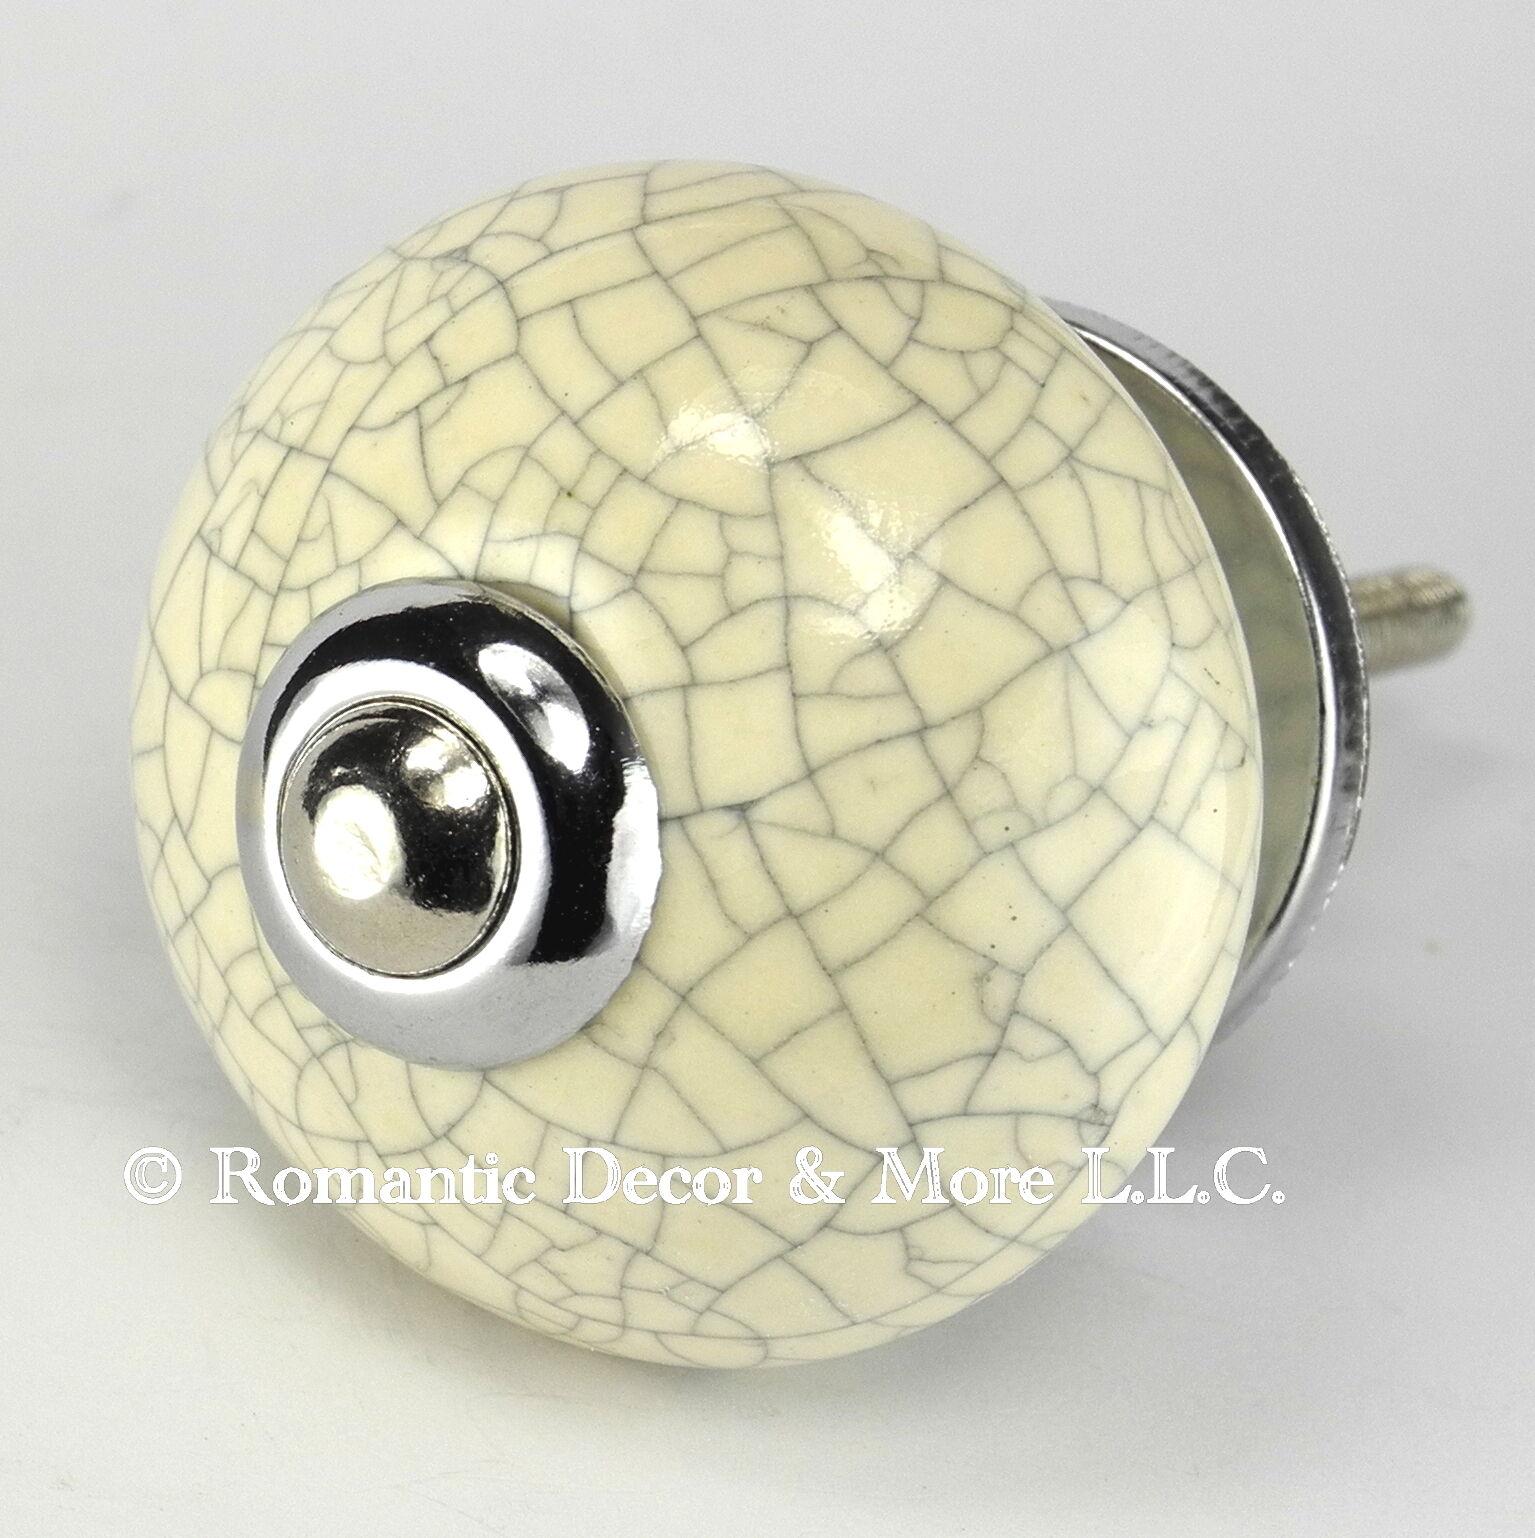 Decorative Drawer Pulls, Handle for Kitchen Cabinets or Ceramic Door Knob  C20RR